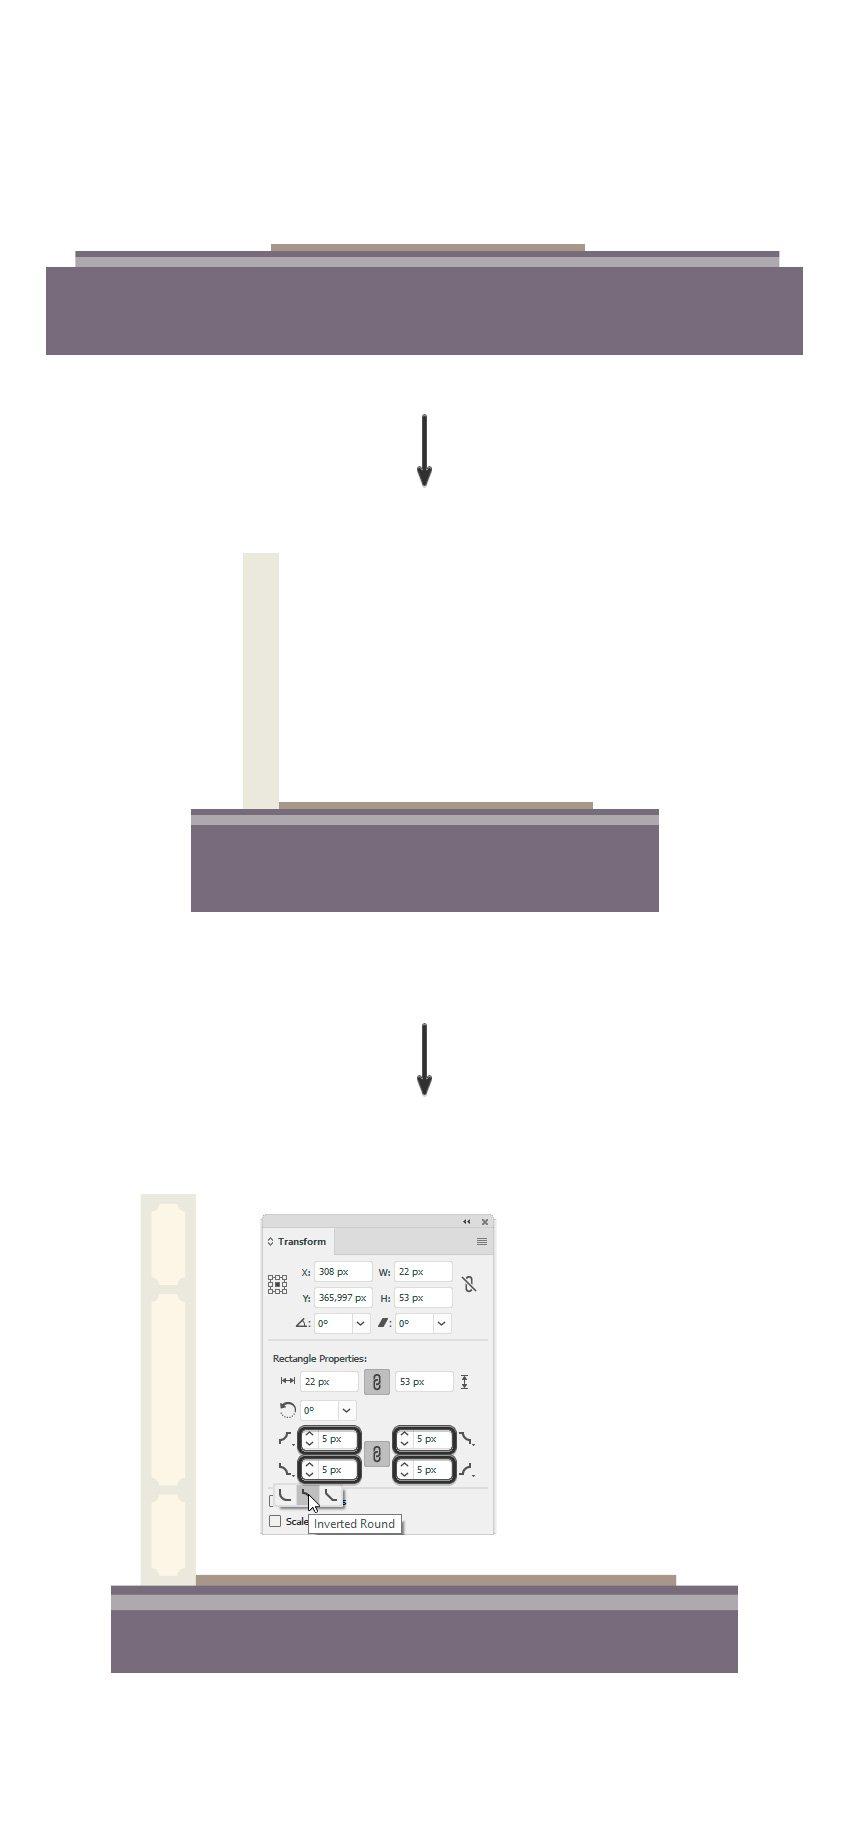 Adding a column